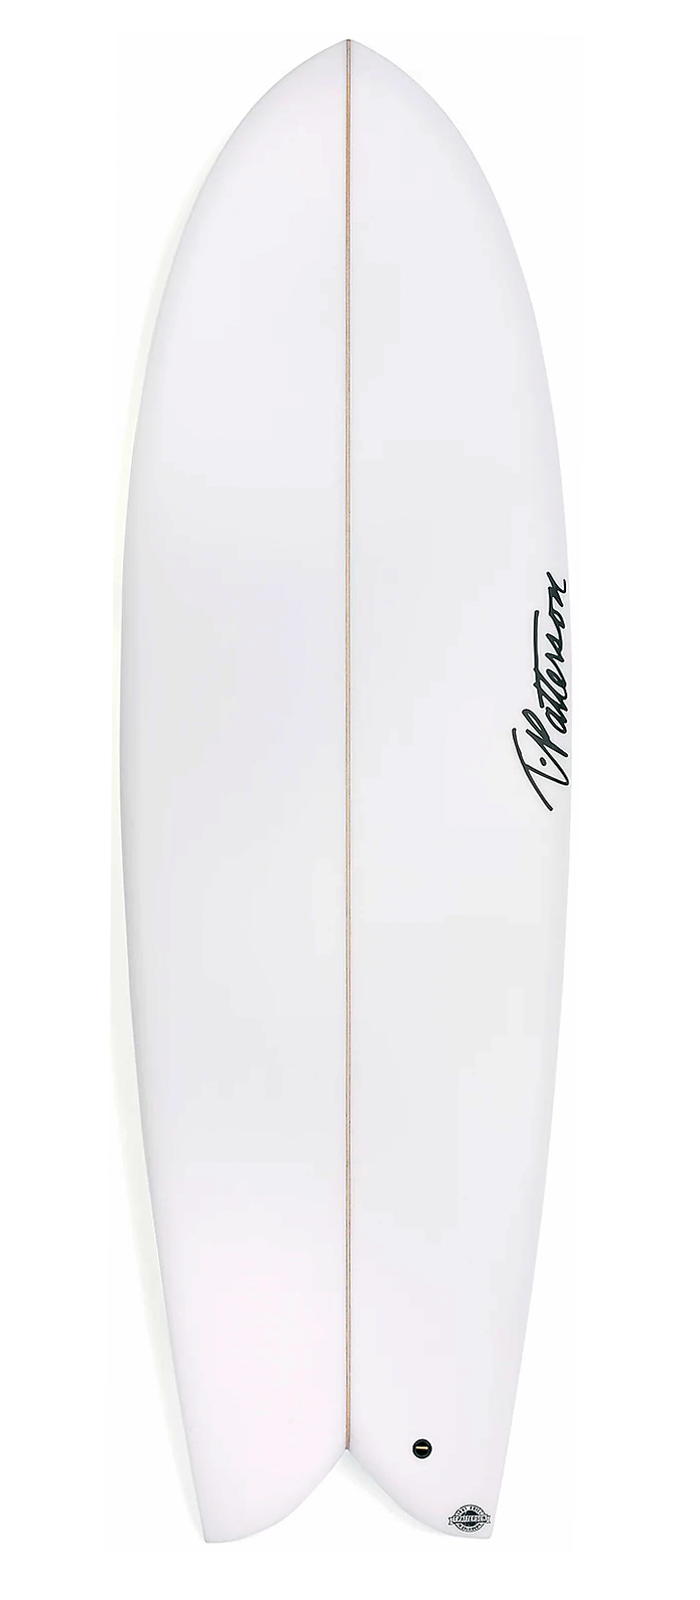 CALIFORNIA TWIN surfboard model